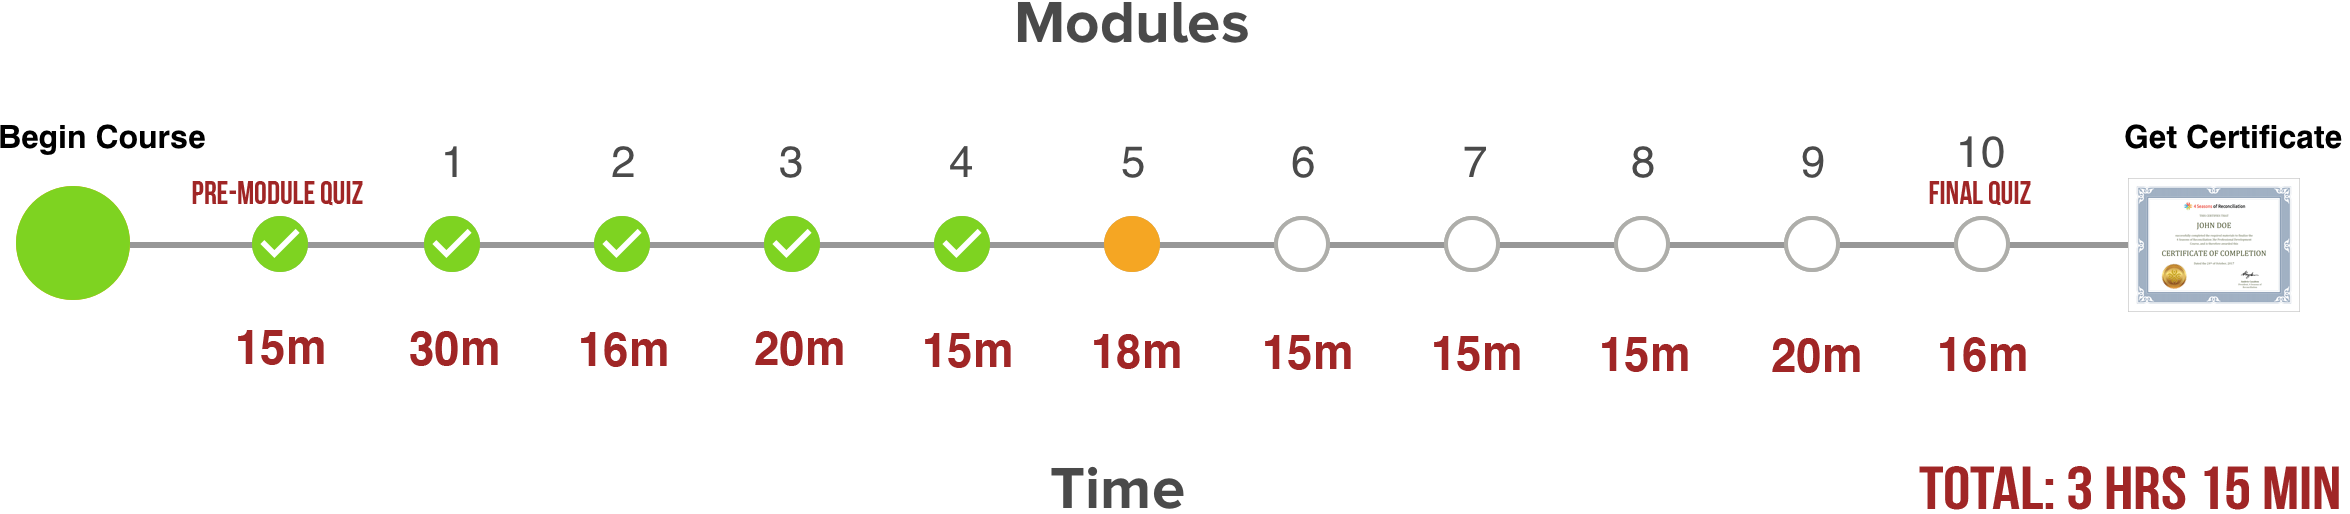 Module5_Orange.png